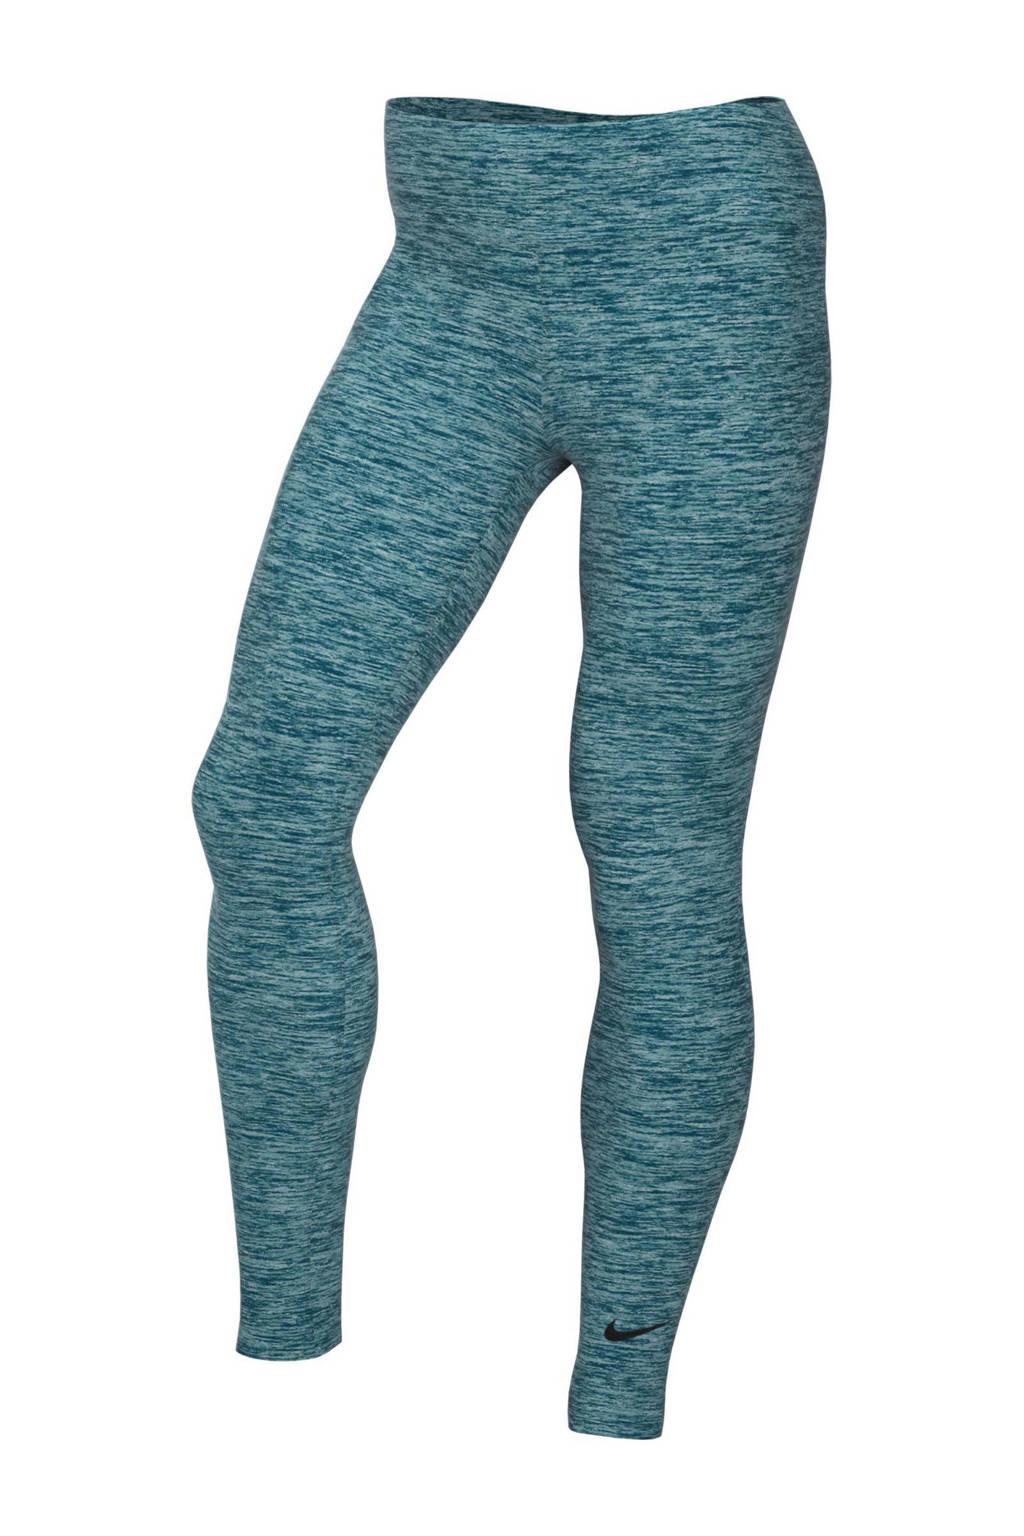 Nike 7/8 sportbroek turquoise, Turquoise